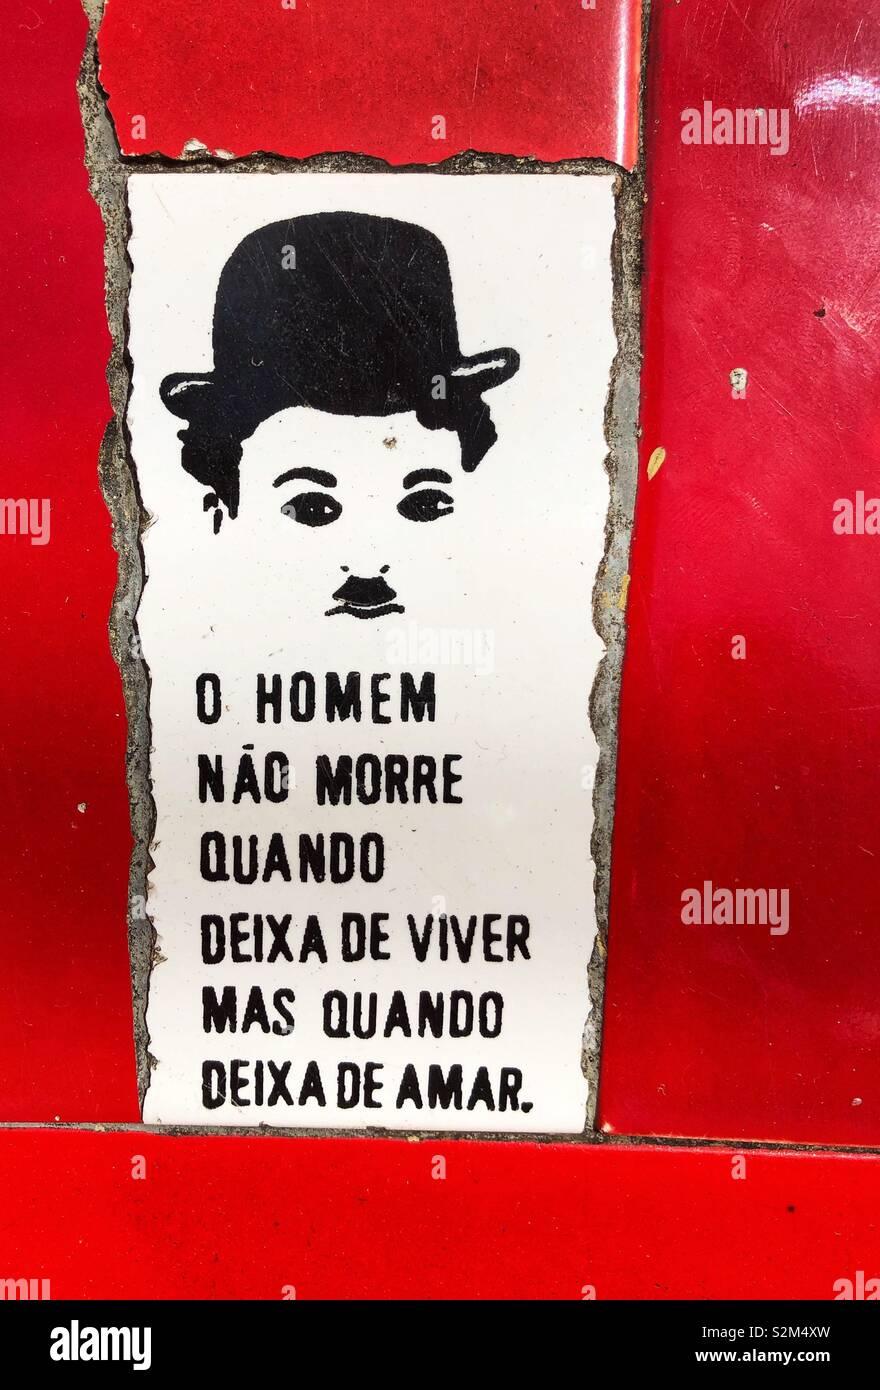 Portuguese language on a red and white ceramic tile in Rio de Janeiro, Brazil. Stock Photo